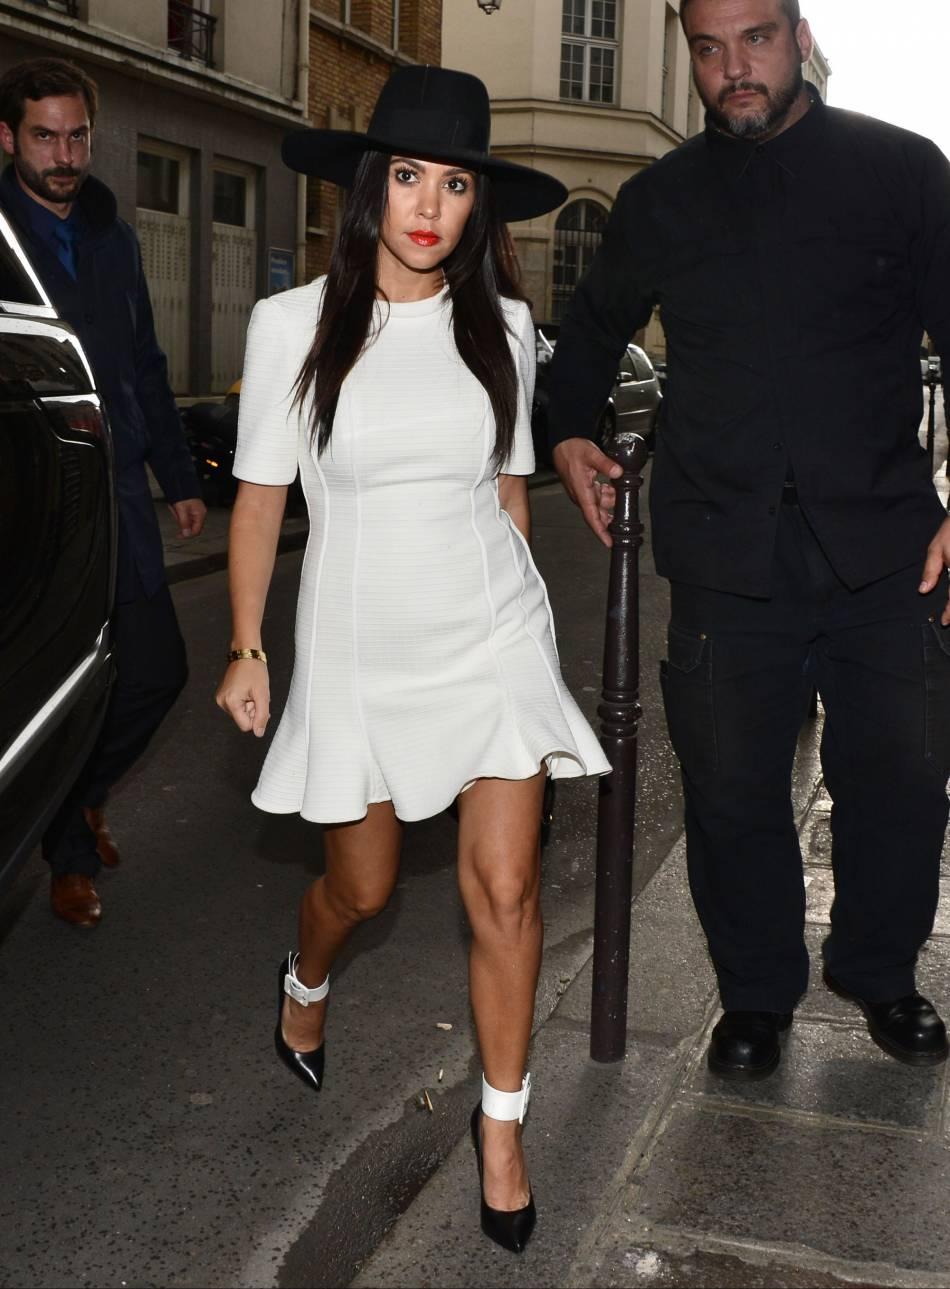 Sexy en petite robe blanche !